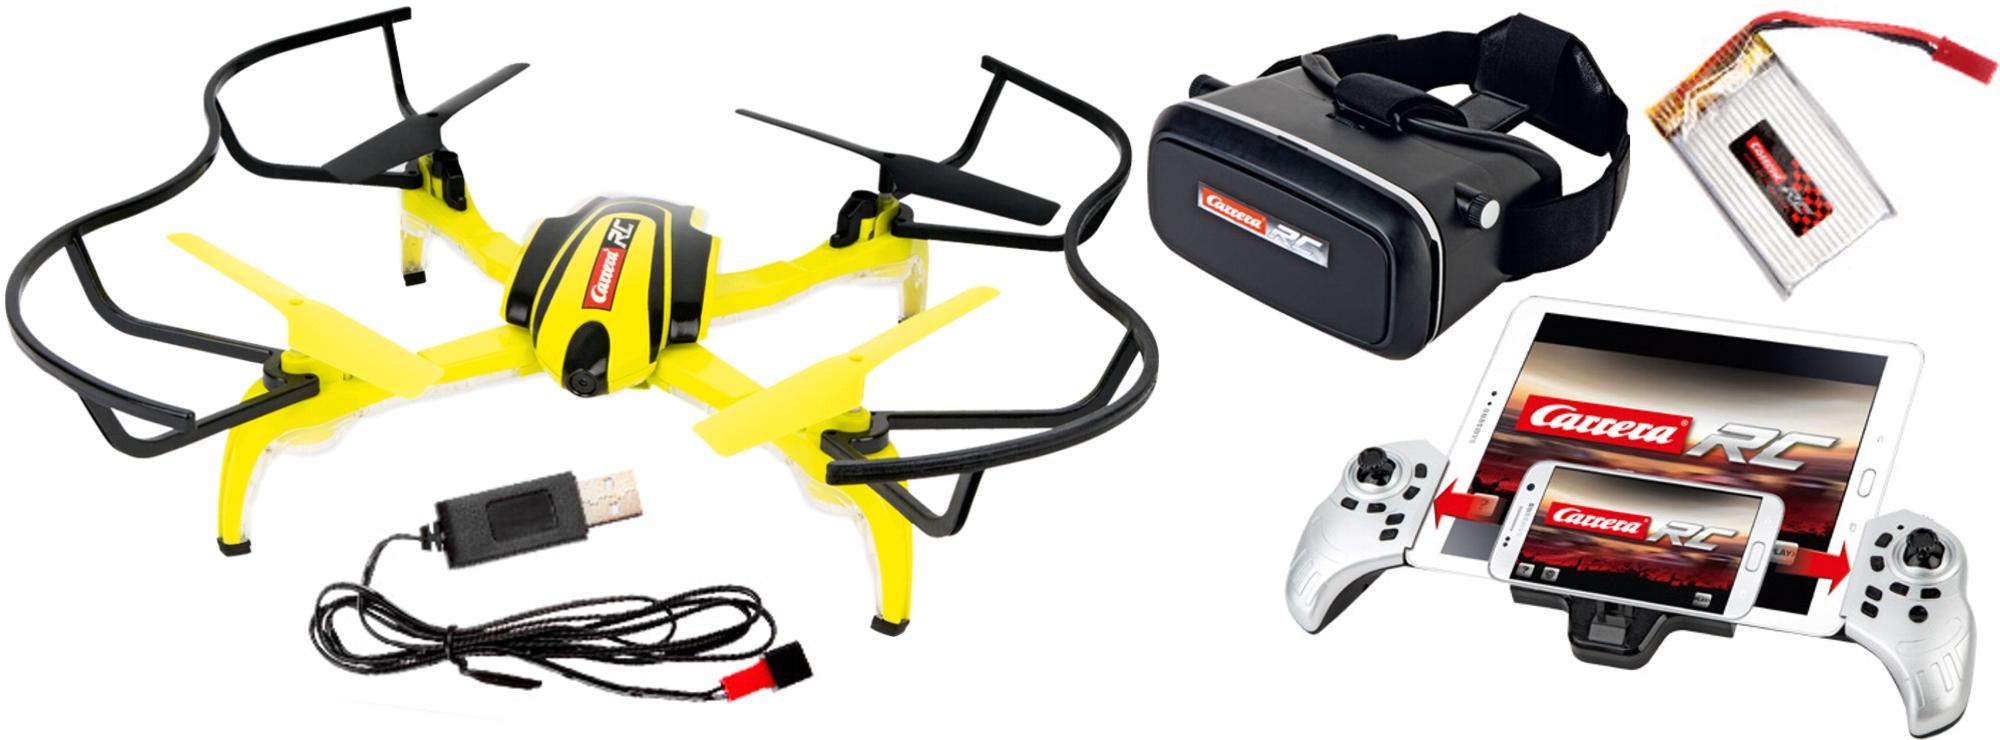 Carrera RC Quadrocopter HD Next mit 720p Kamera und Brille 503019 Neu